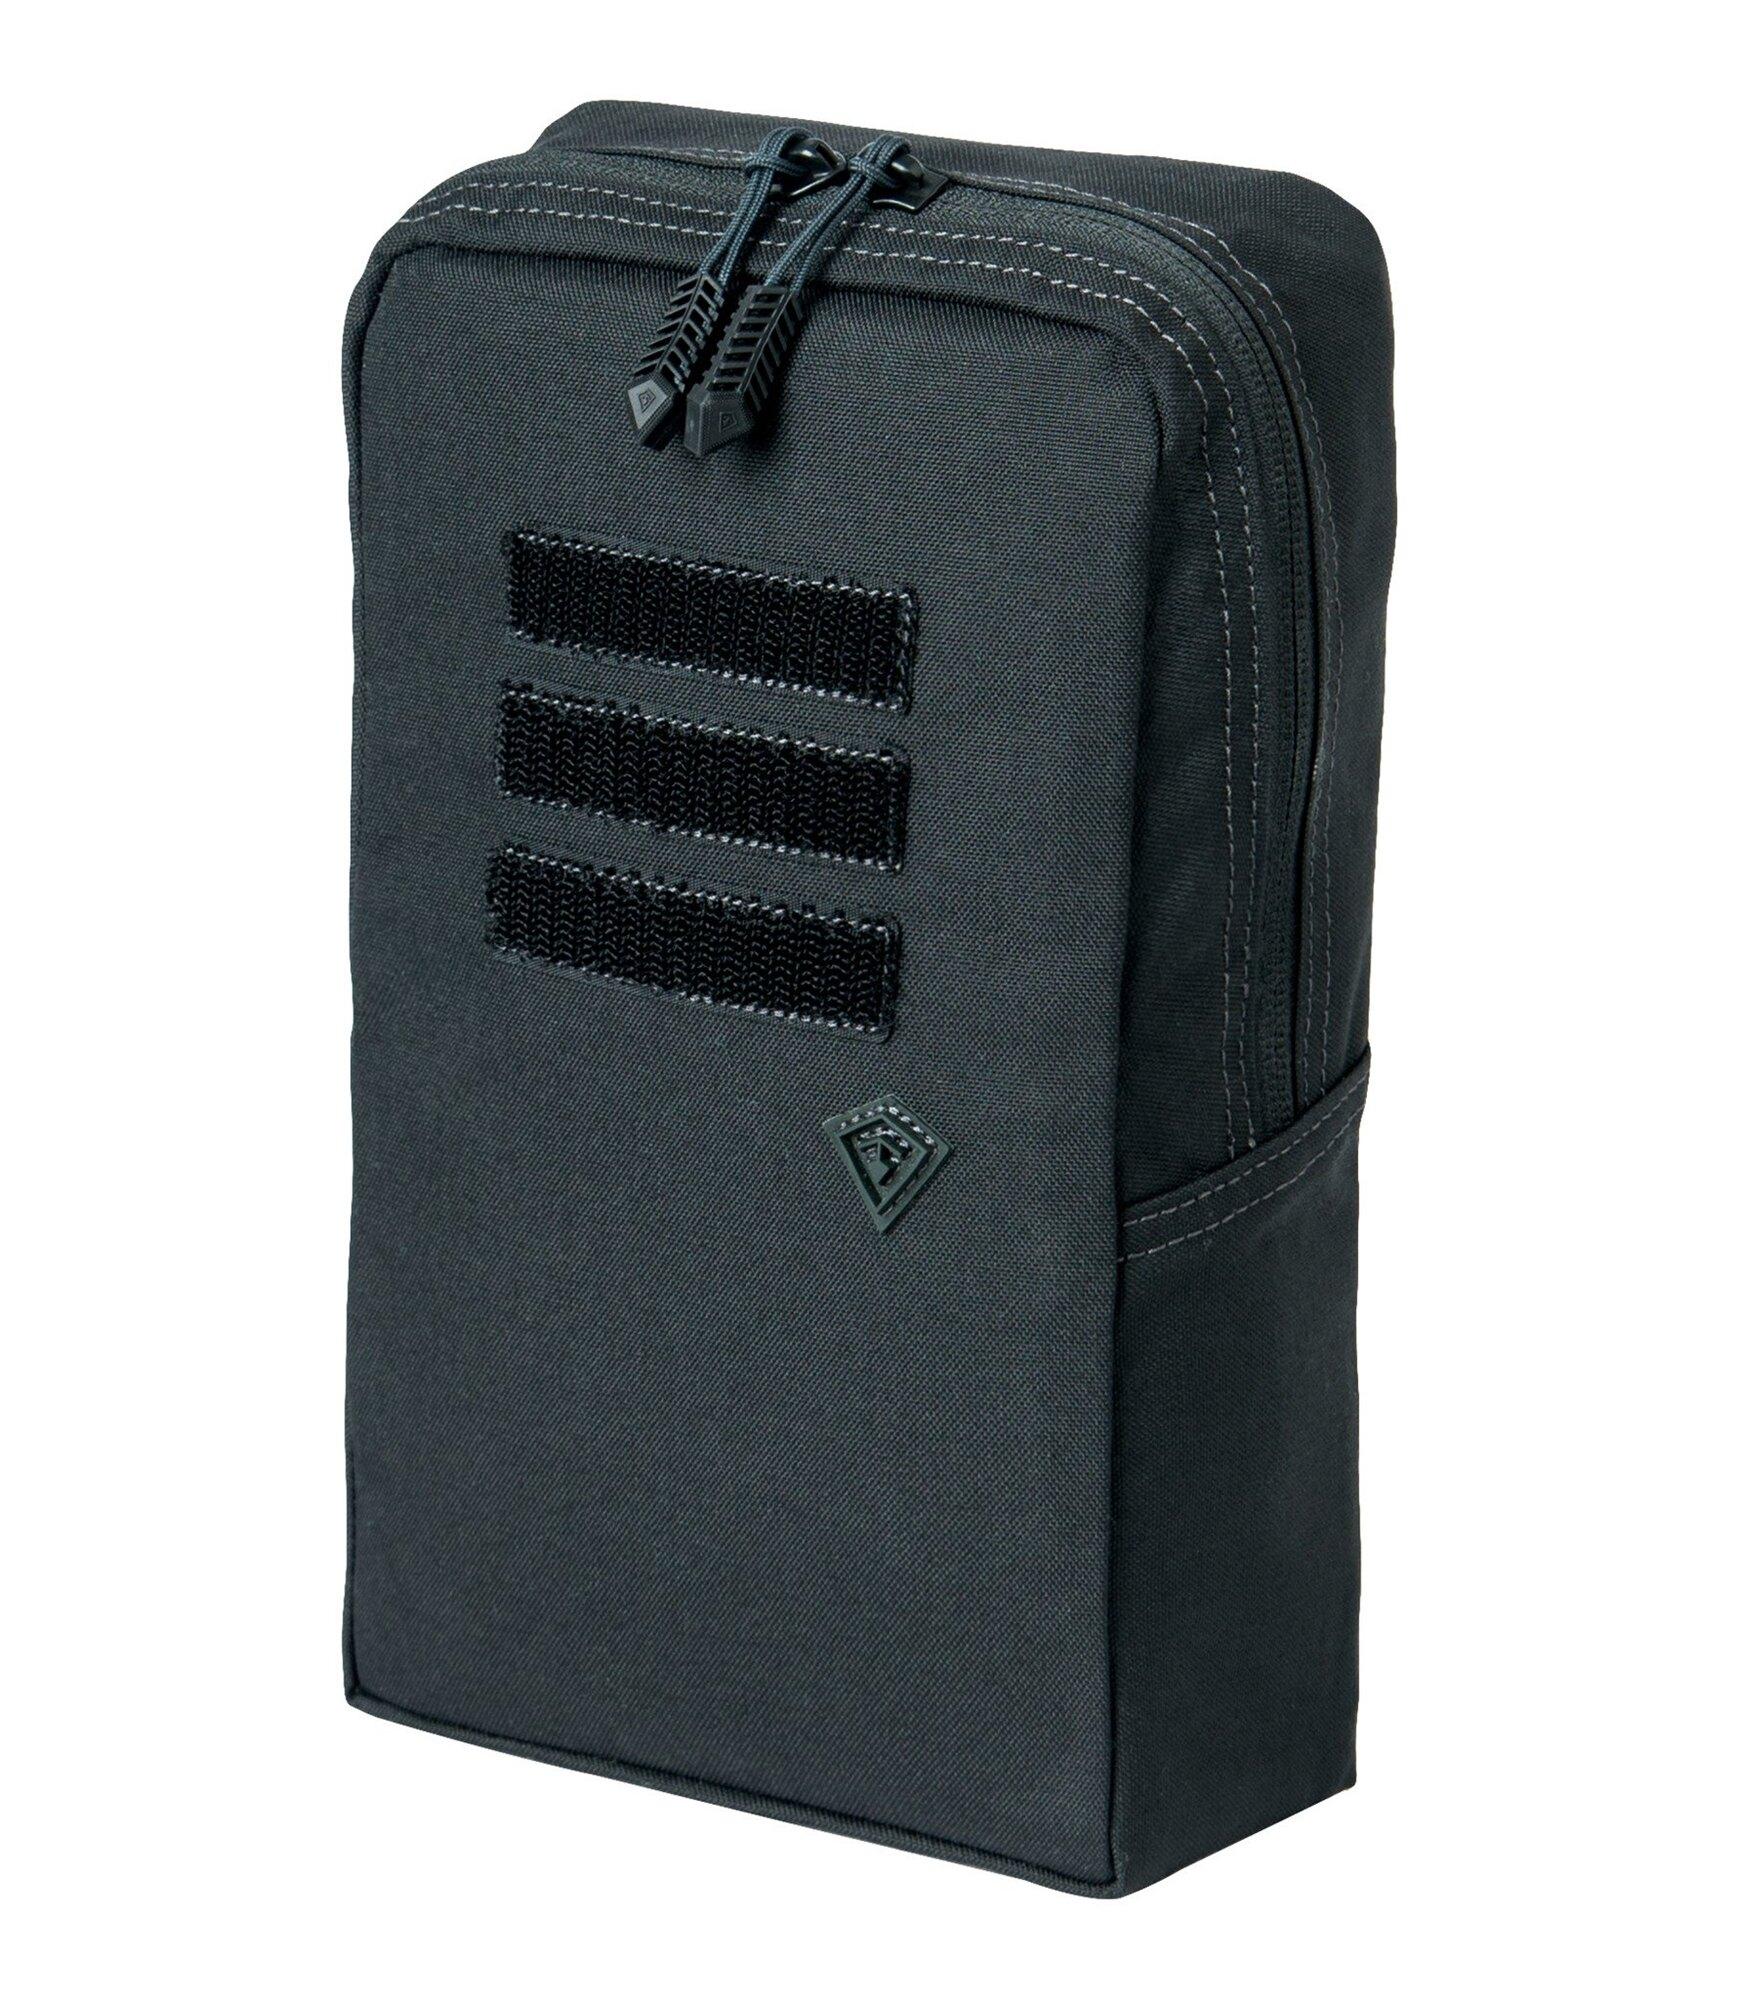 Puzdro Tactix 6x10 Utility First Tactical® - čierne (Farba: Čierna)